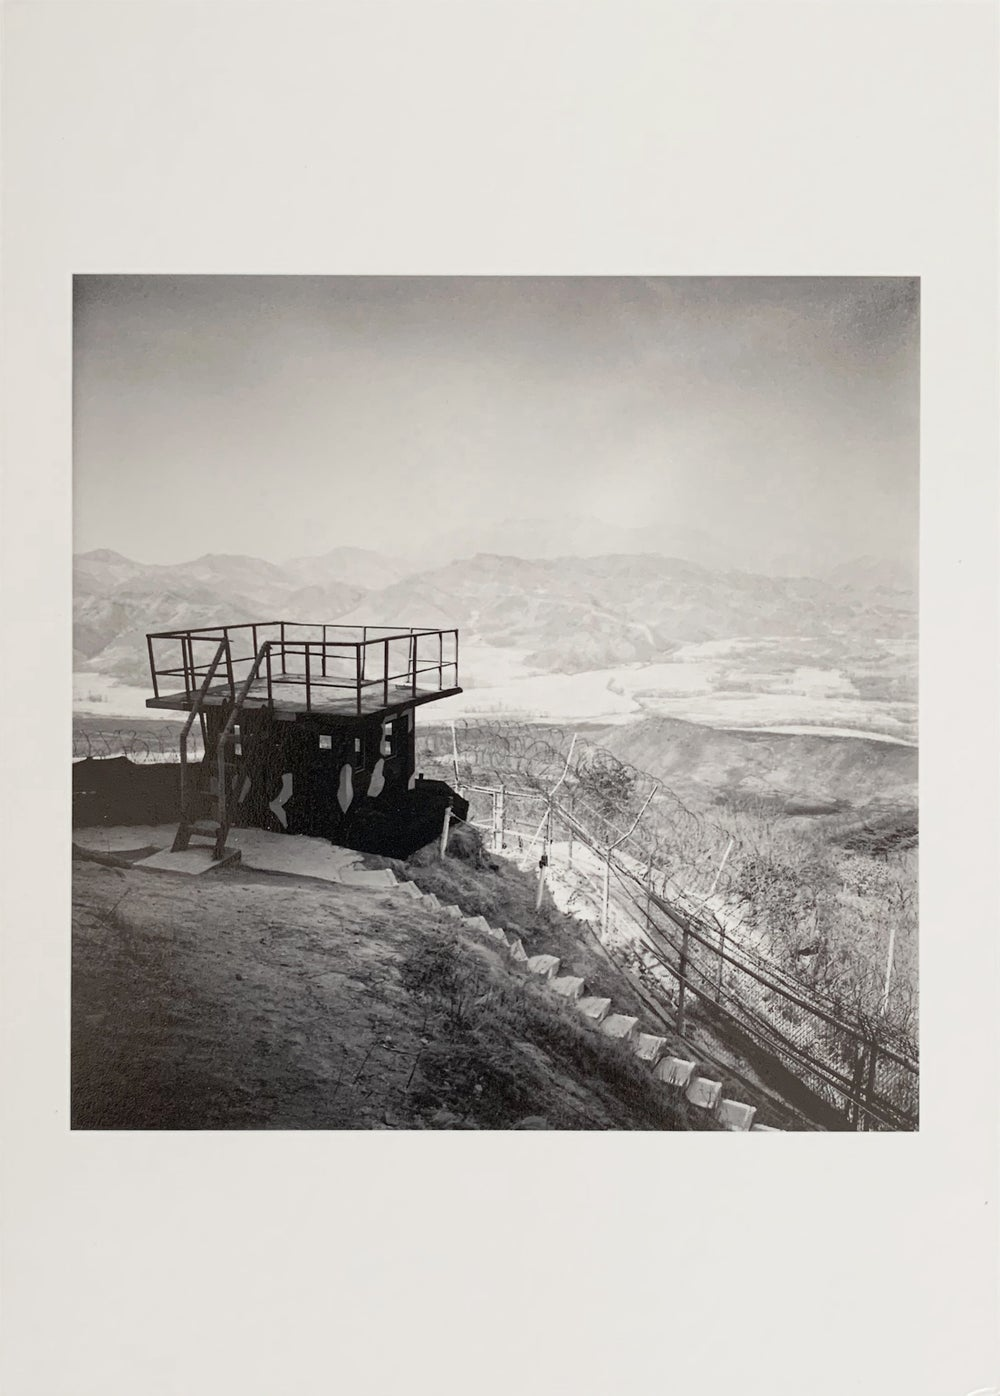 Michael KENNA - DMZ, The 38th Parallel, Korea